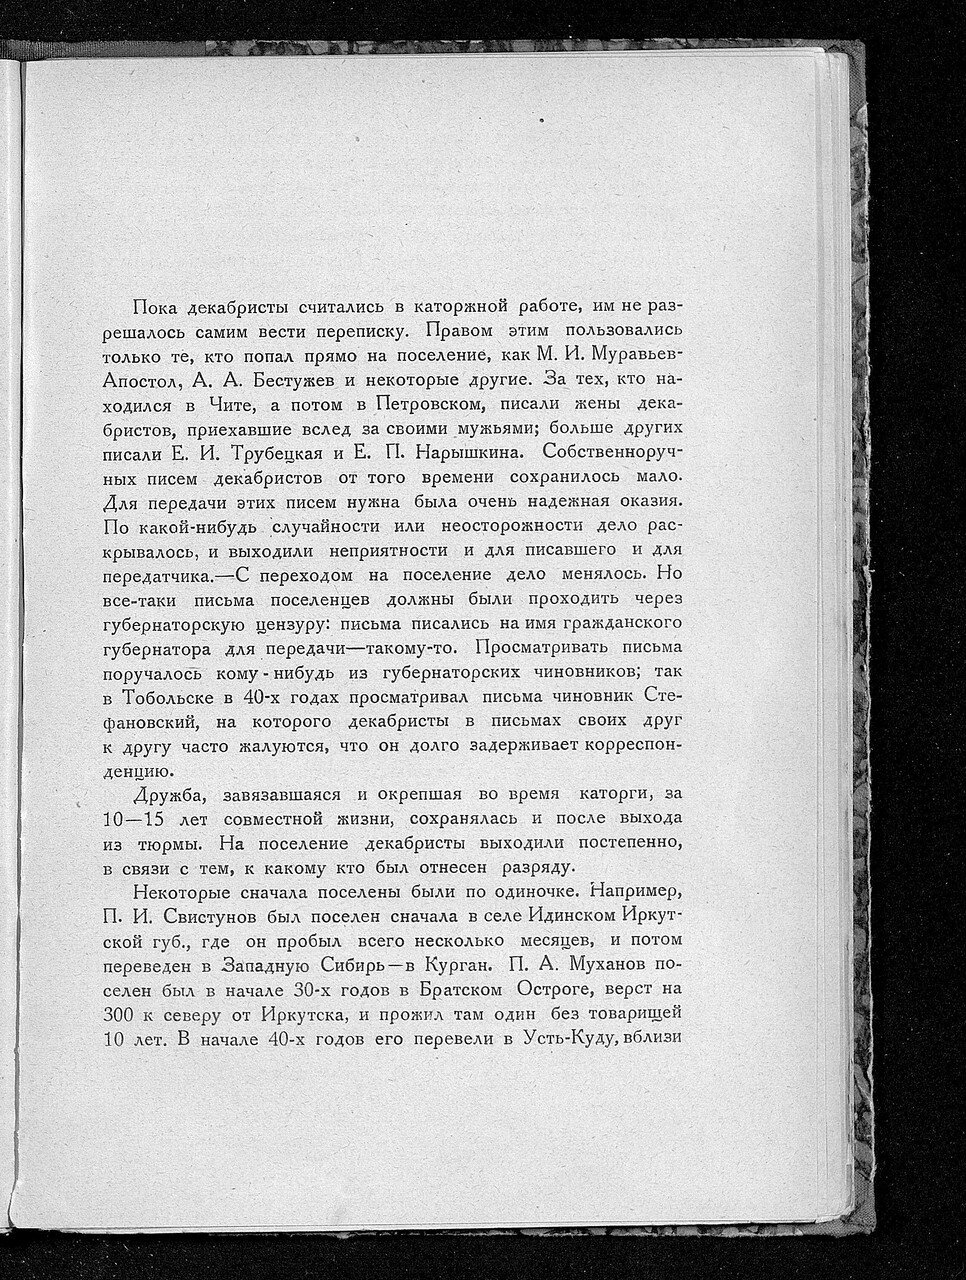 https://img-fotki.yandex.ru/get/875526/199368979.a1/0_21433a_e4195e33_XXXL.jpg